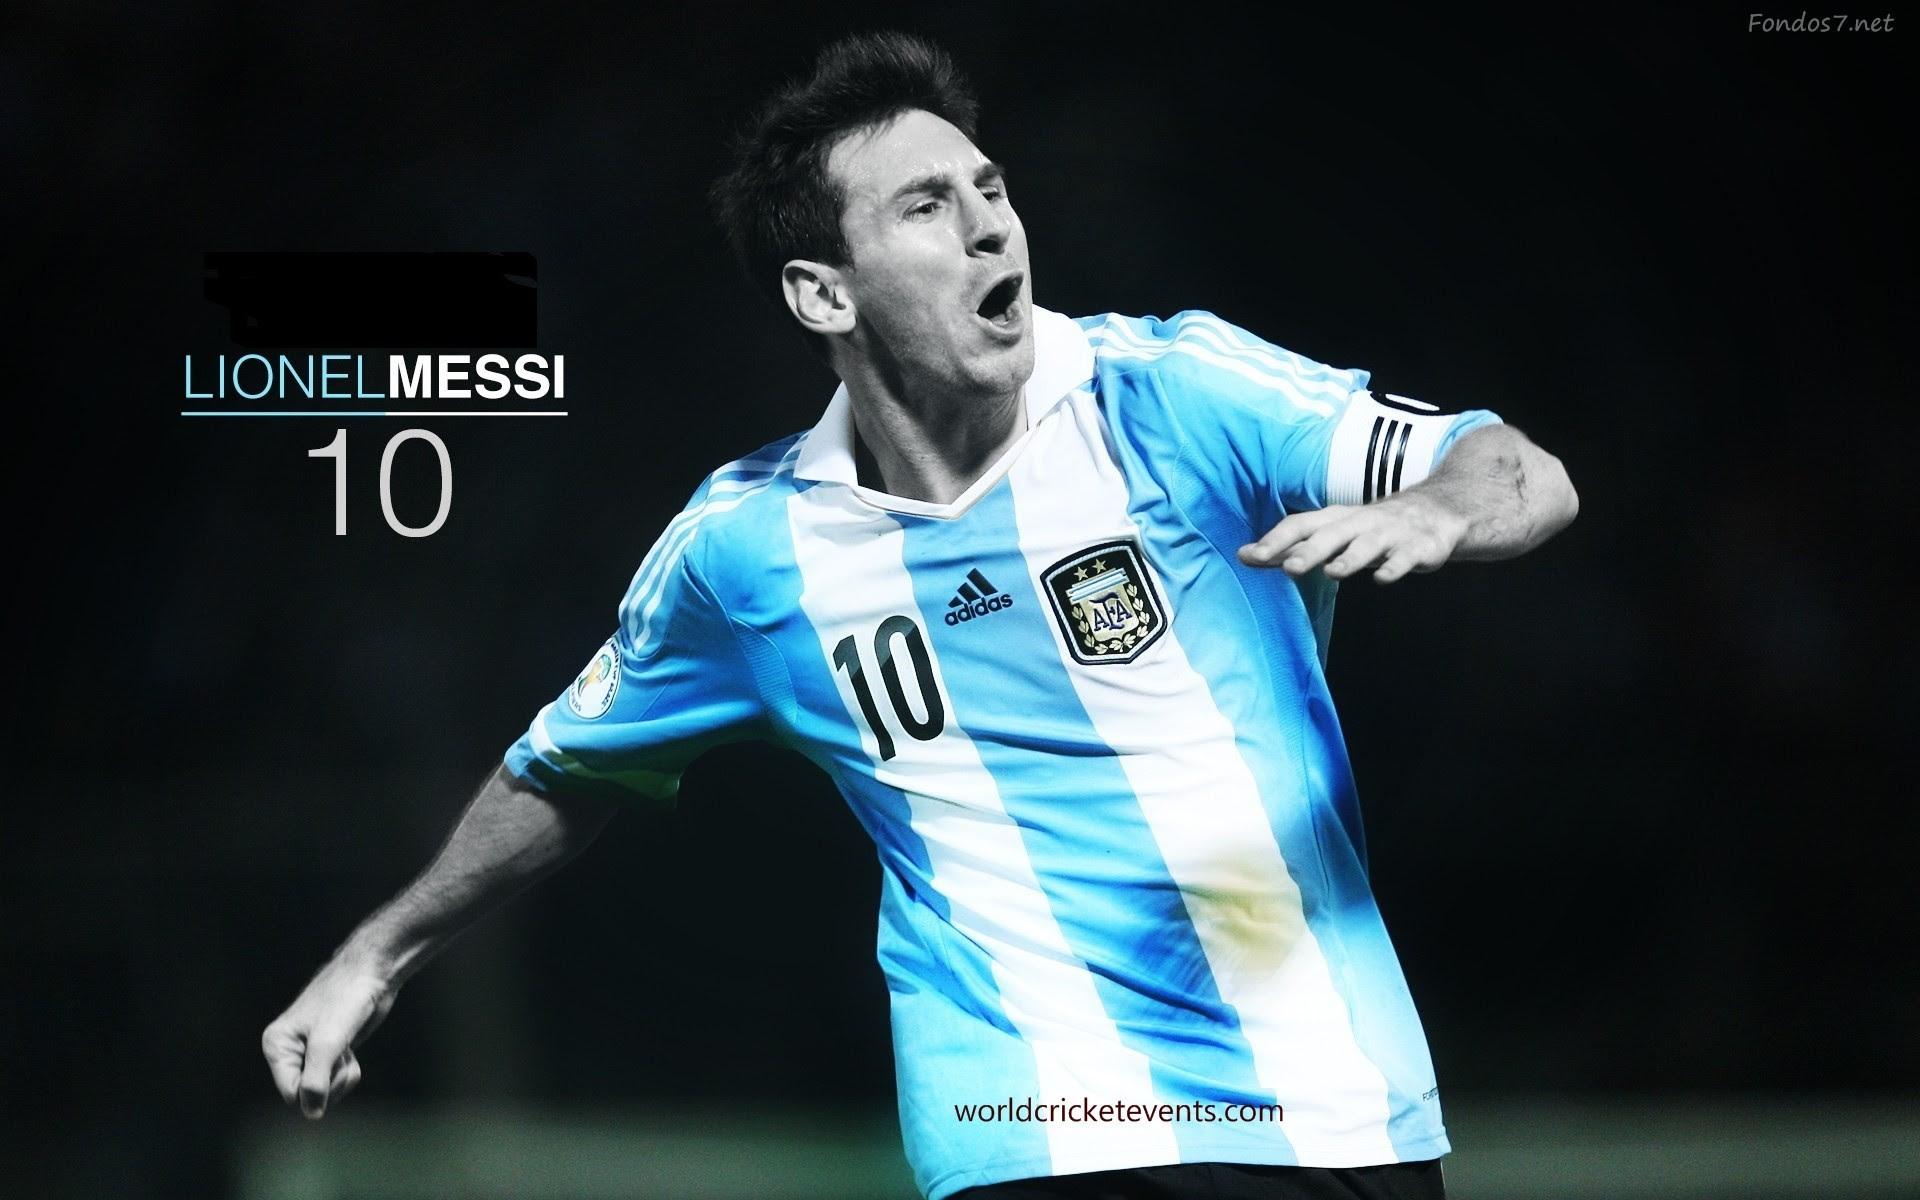 Wallpaper Lionel Messi 2018 (79+ images)